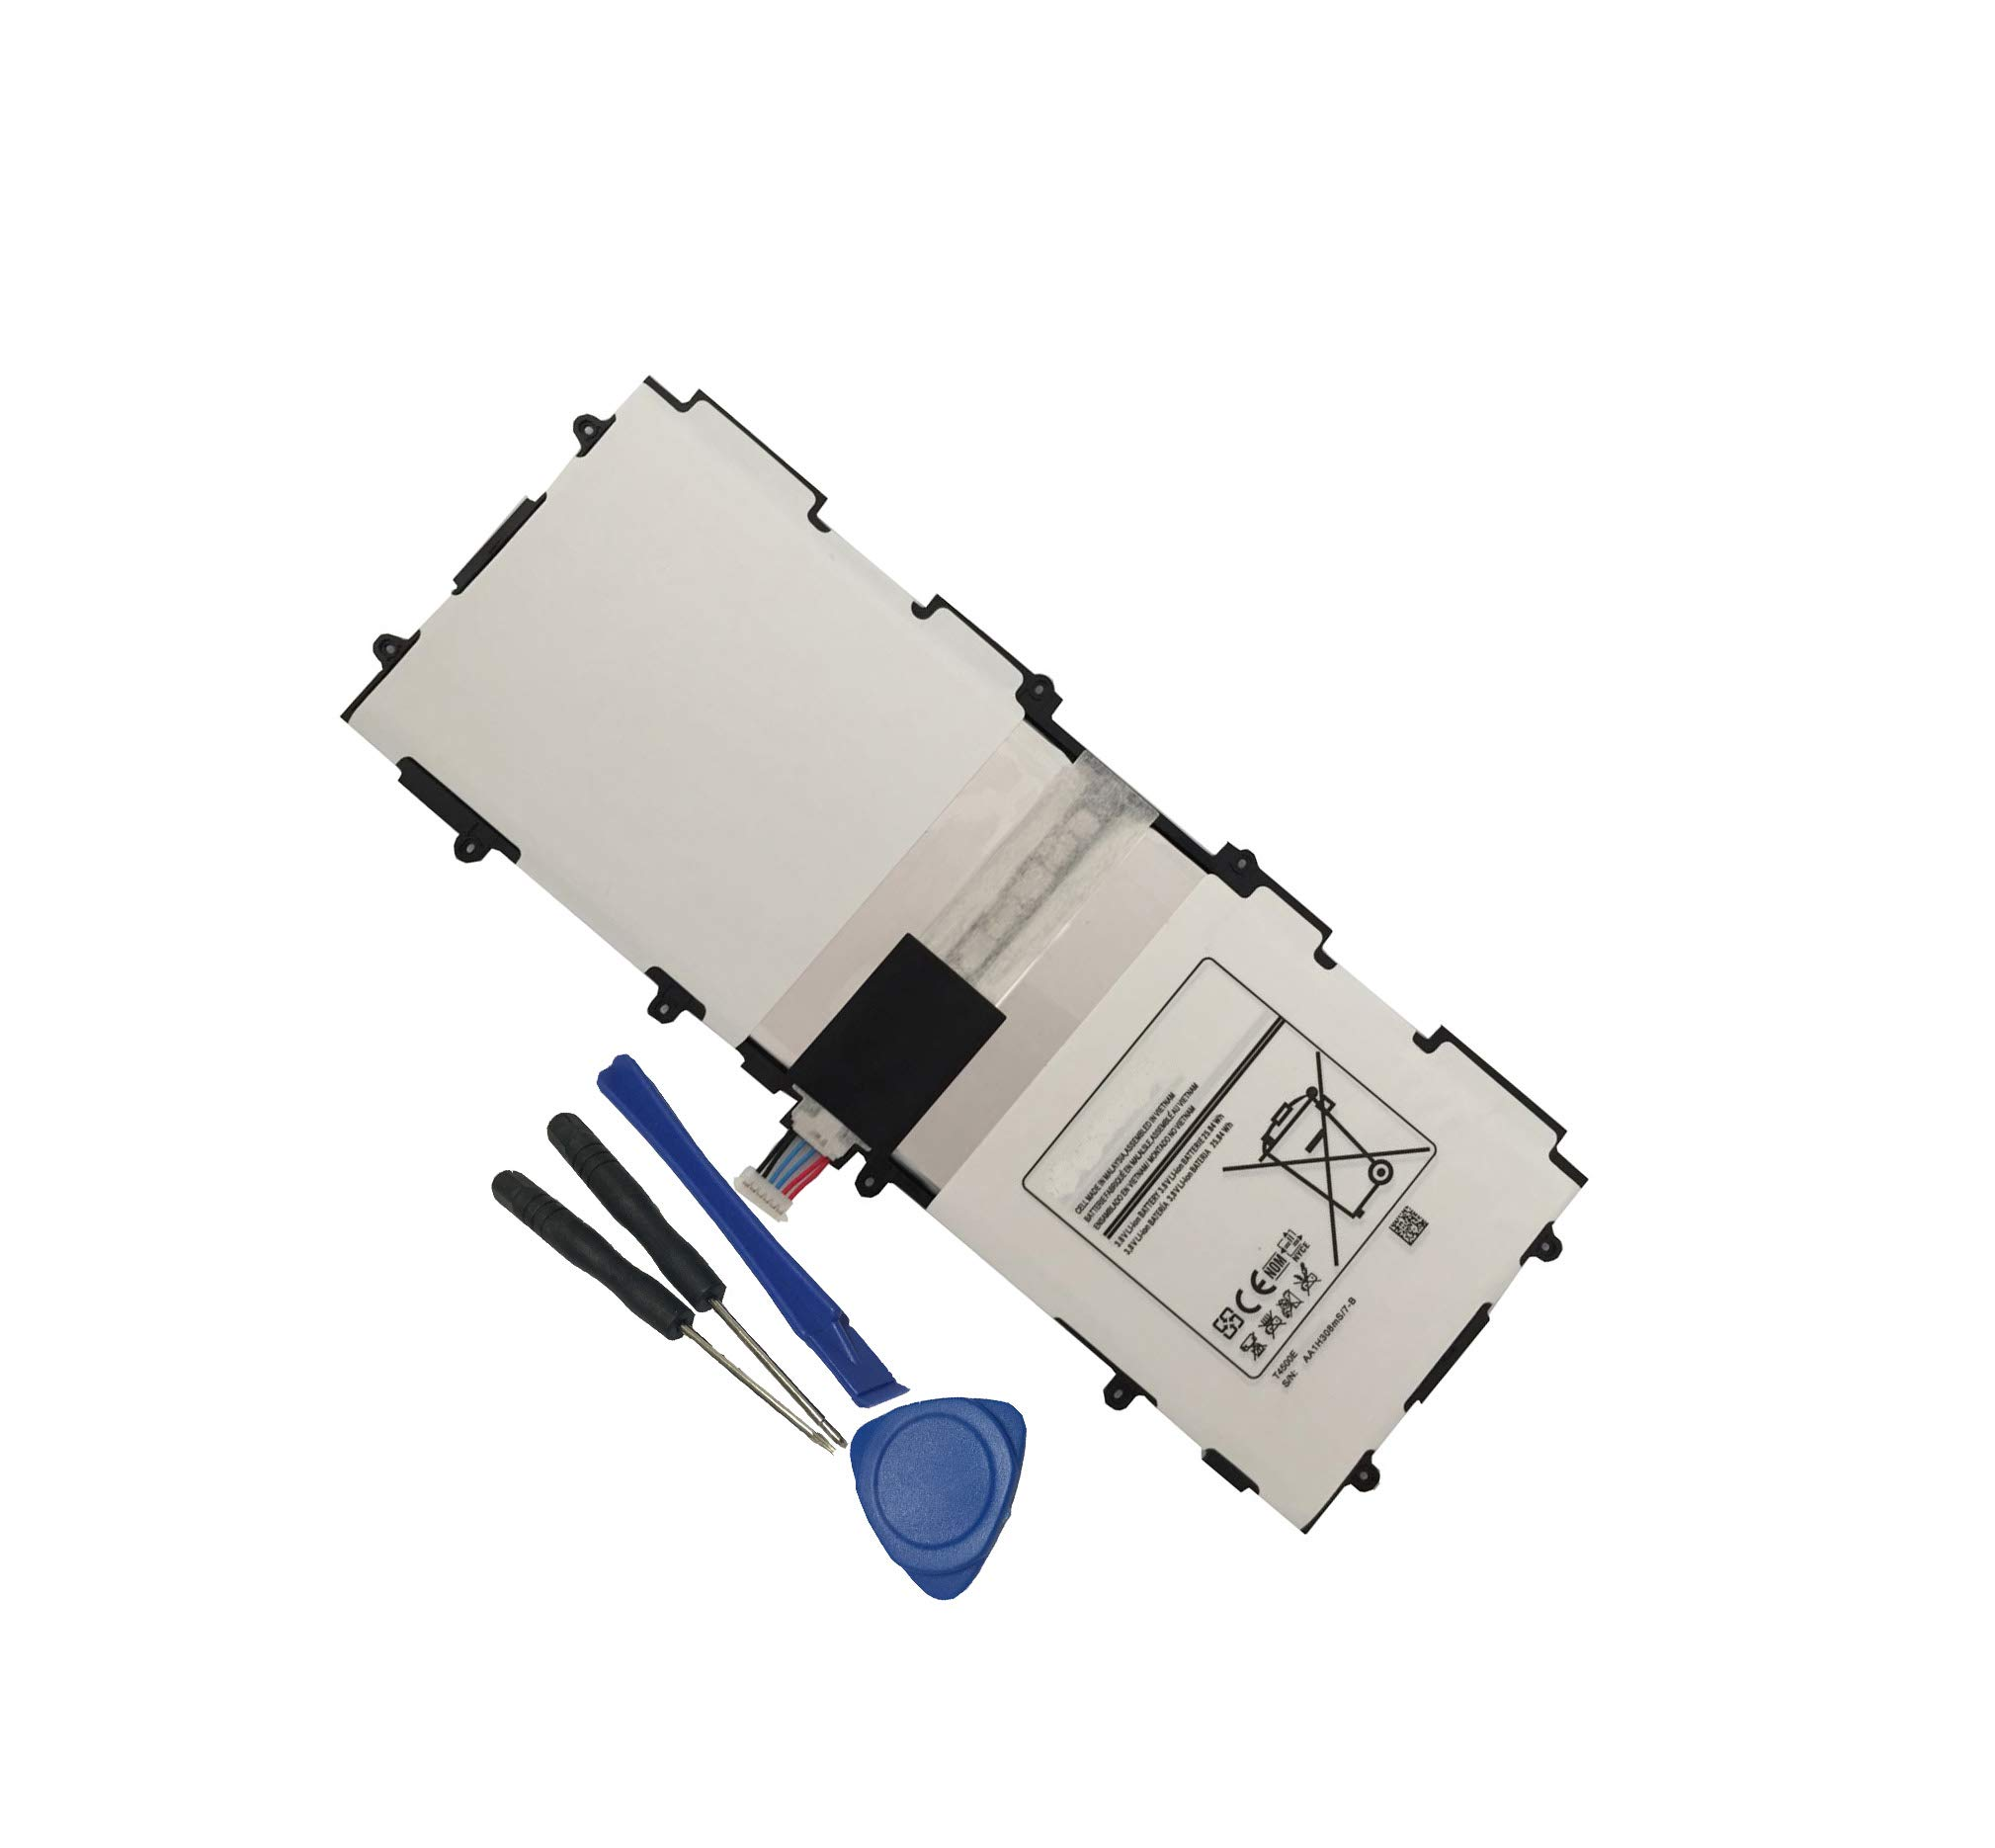 Bateria Tablet T4500e Para Samsung Tab 3 10.1 Gt-p5210 P5200